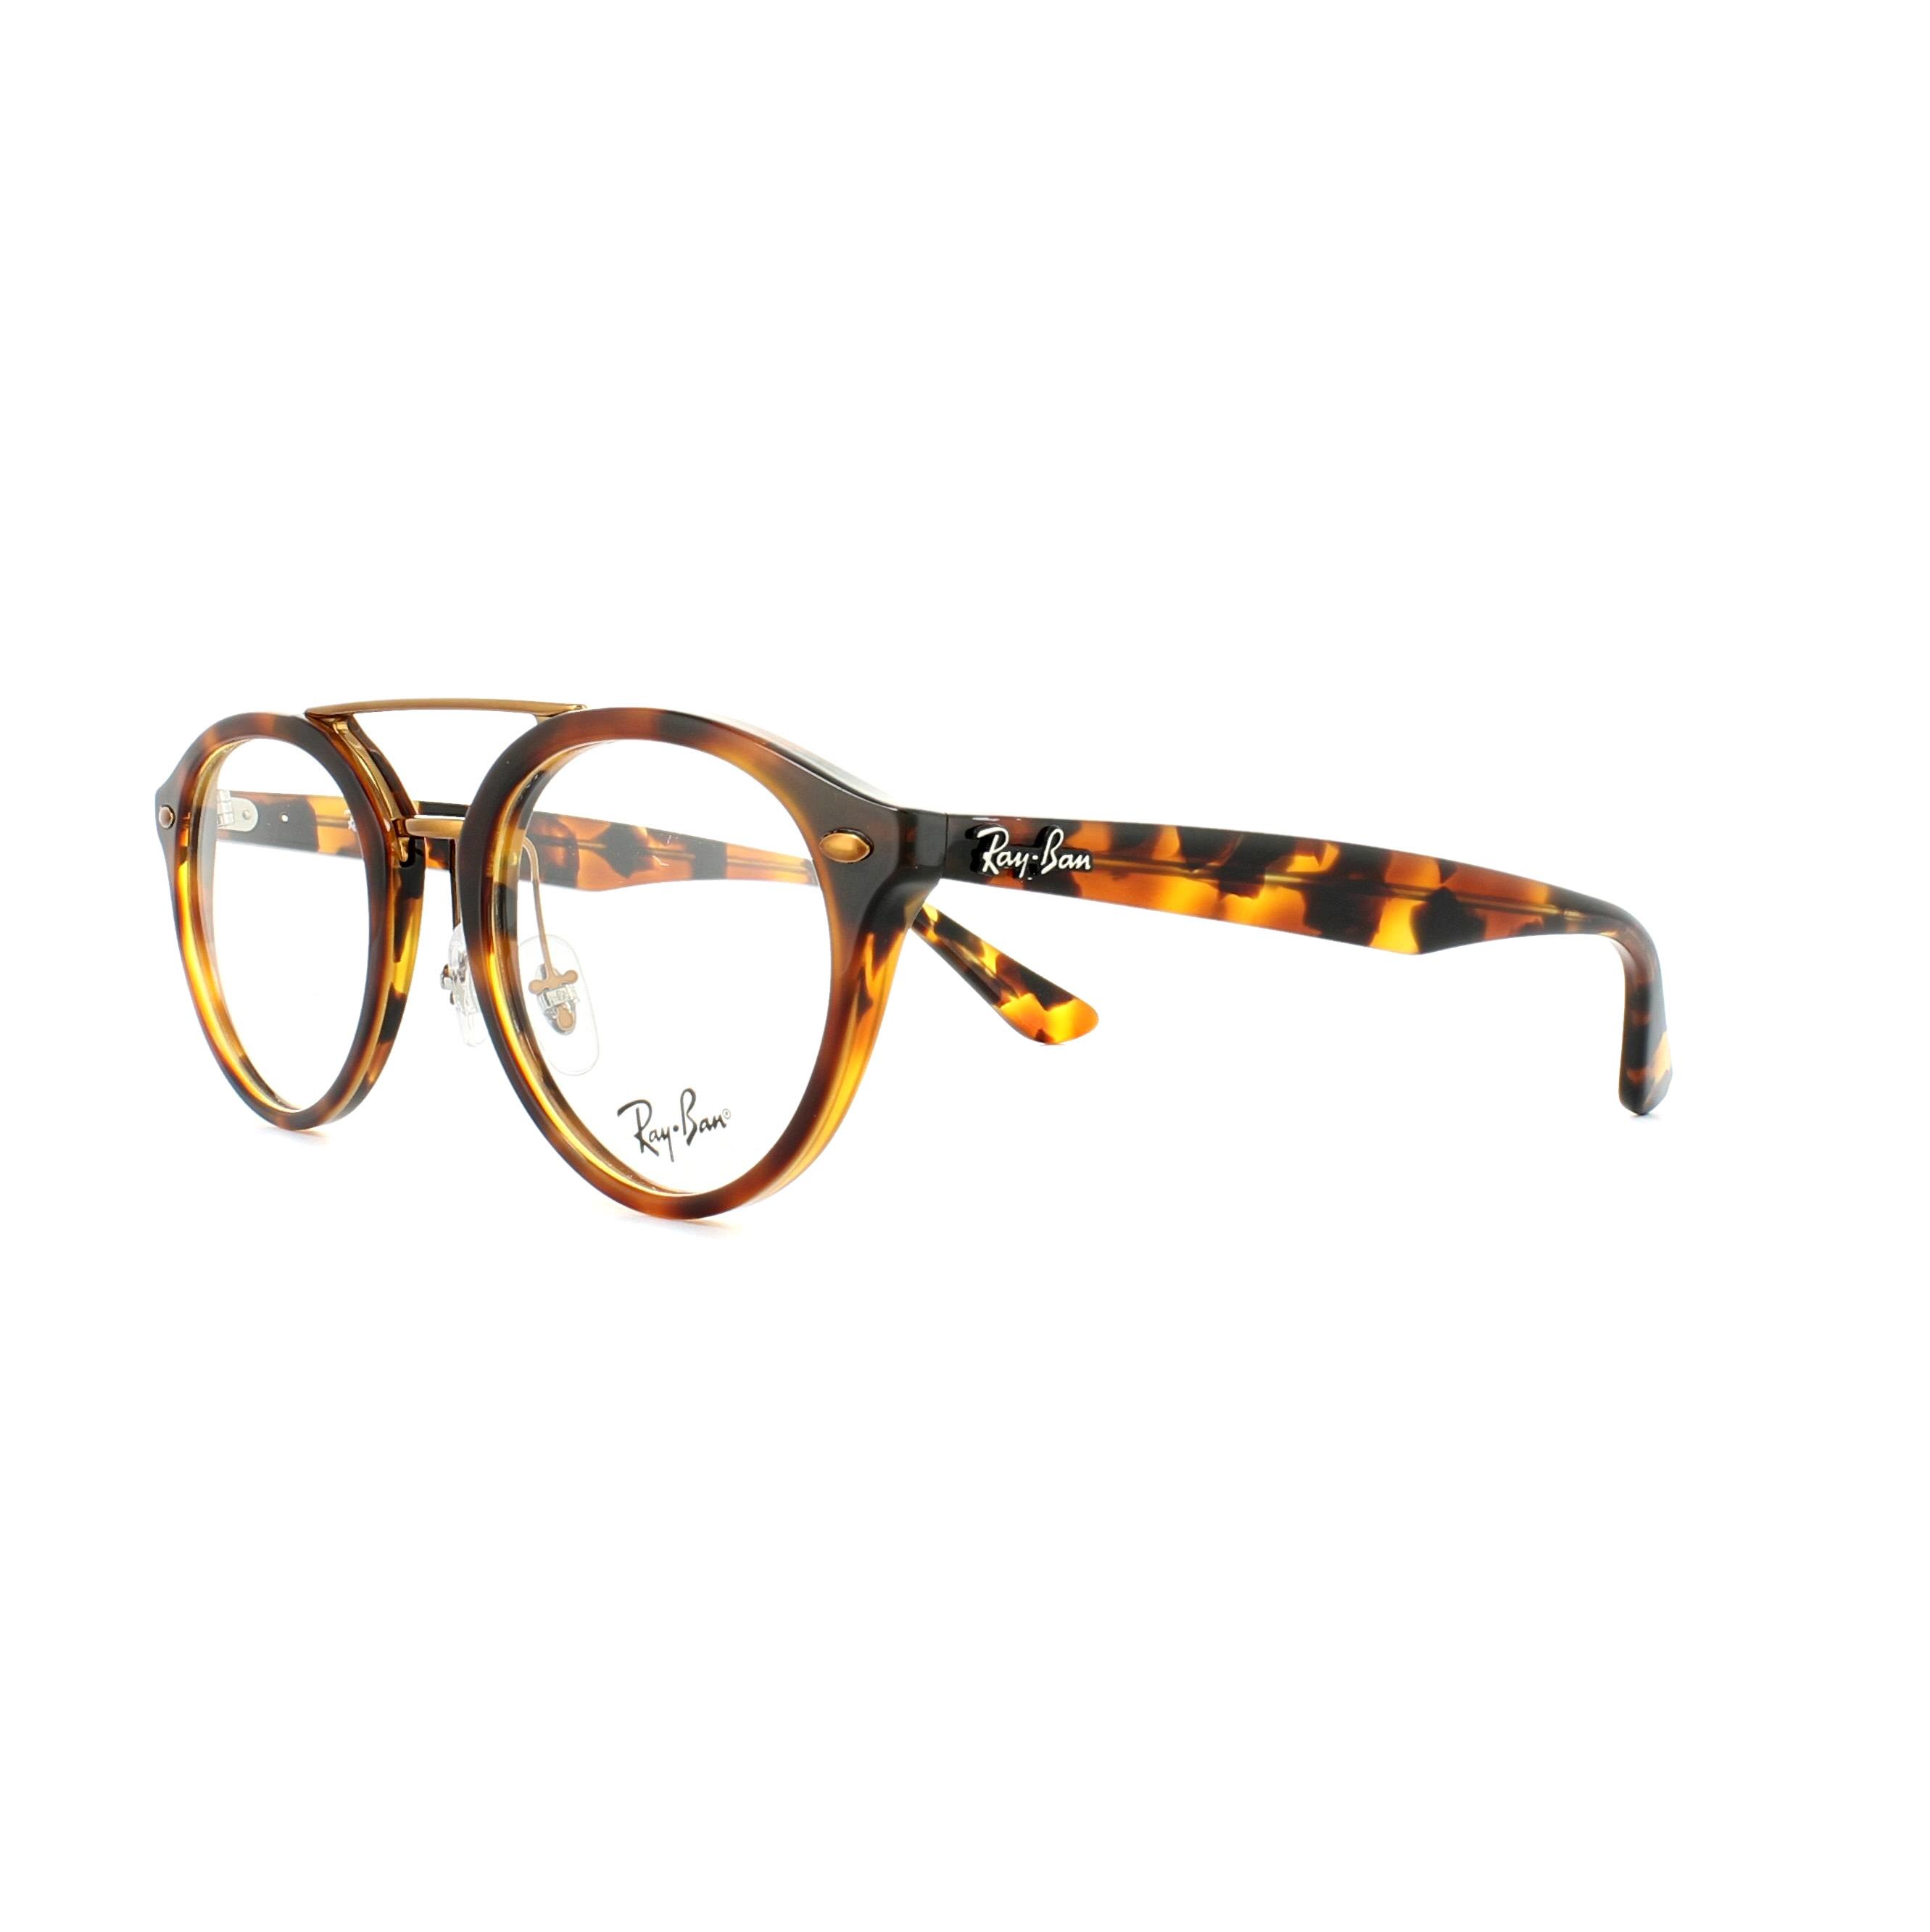 823bfd943389d Sentinel Ray-Ban Glasses Frames 5354 5675 Top Havana Brown Yellow Havana  50mm Mens Womens. Sentinel Thumbnail 2